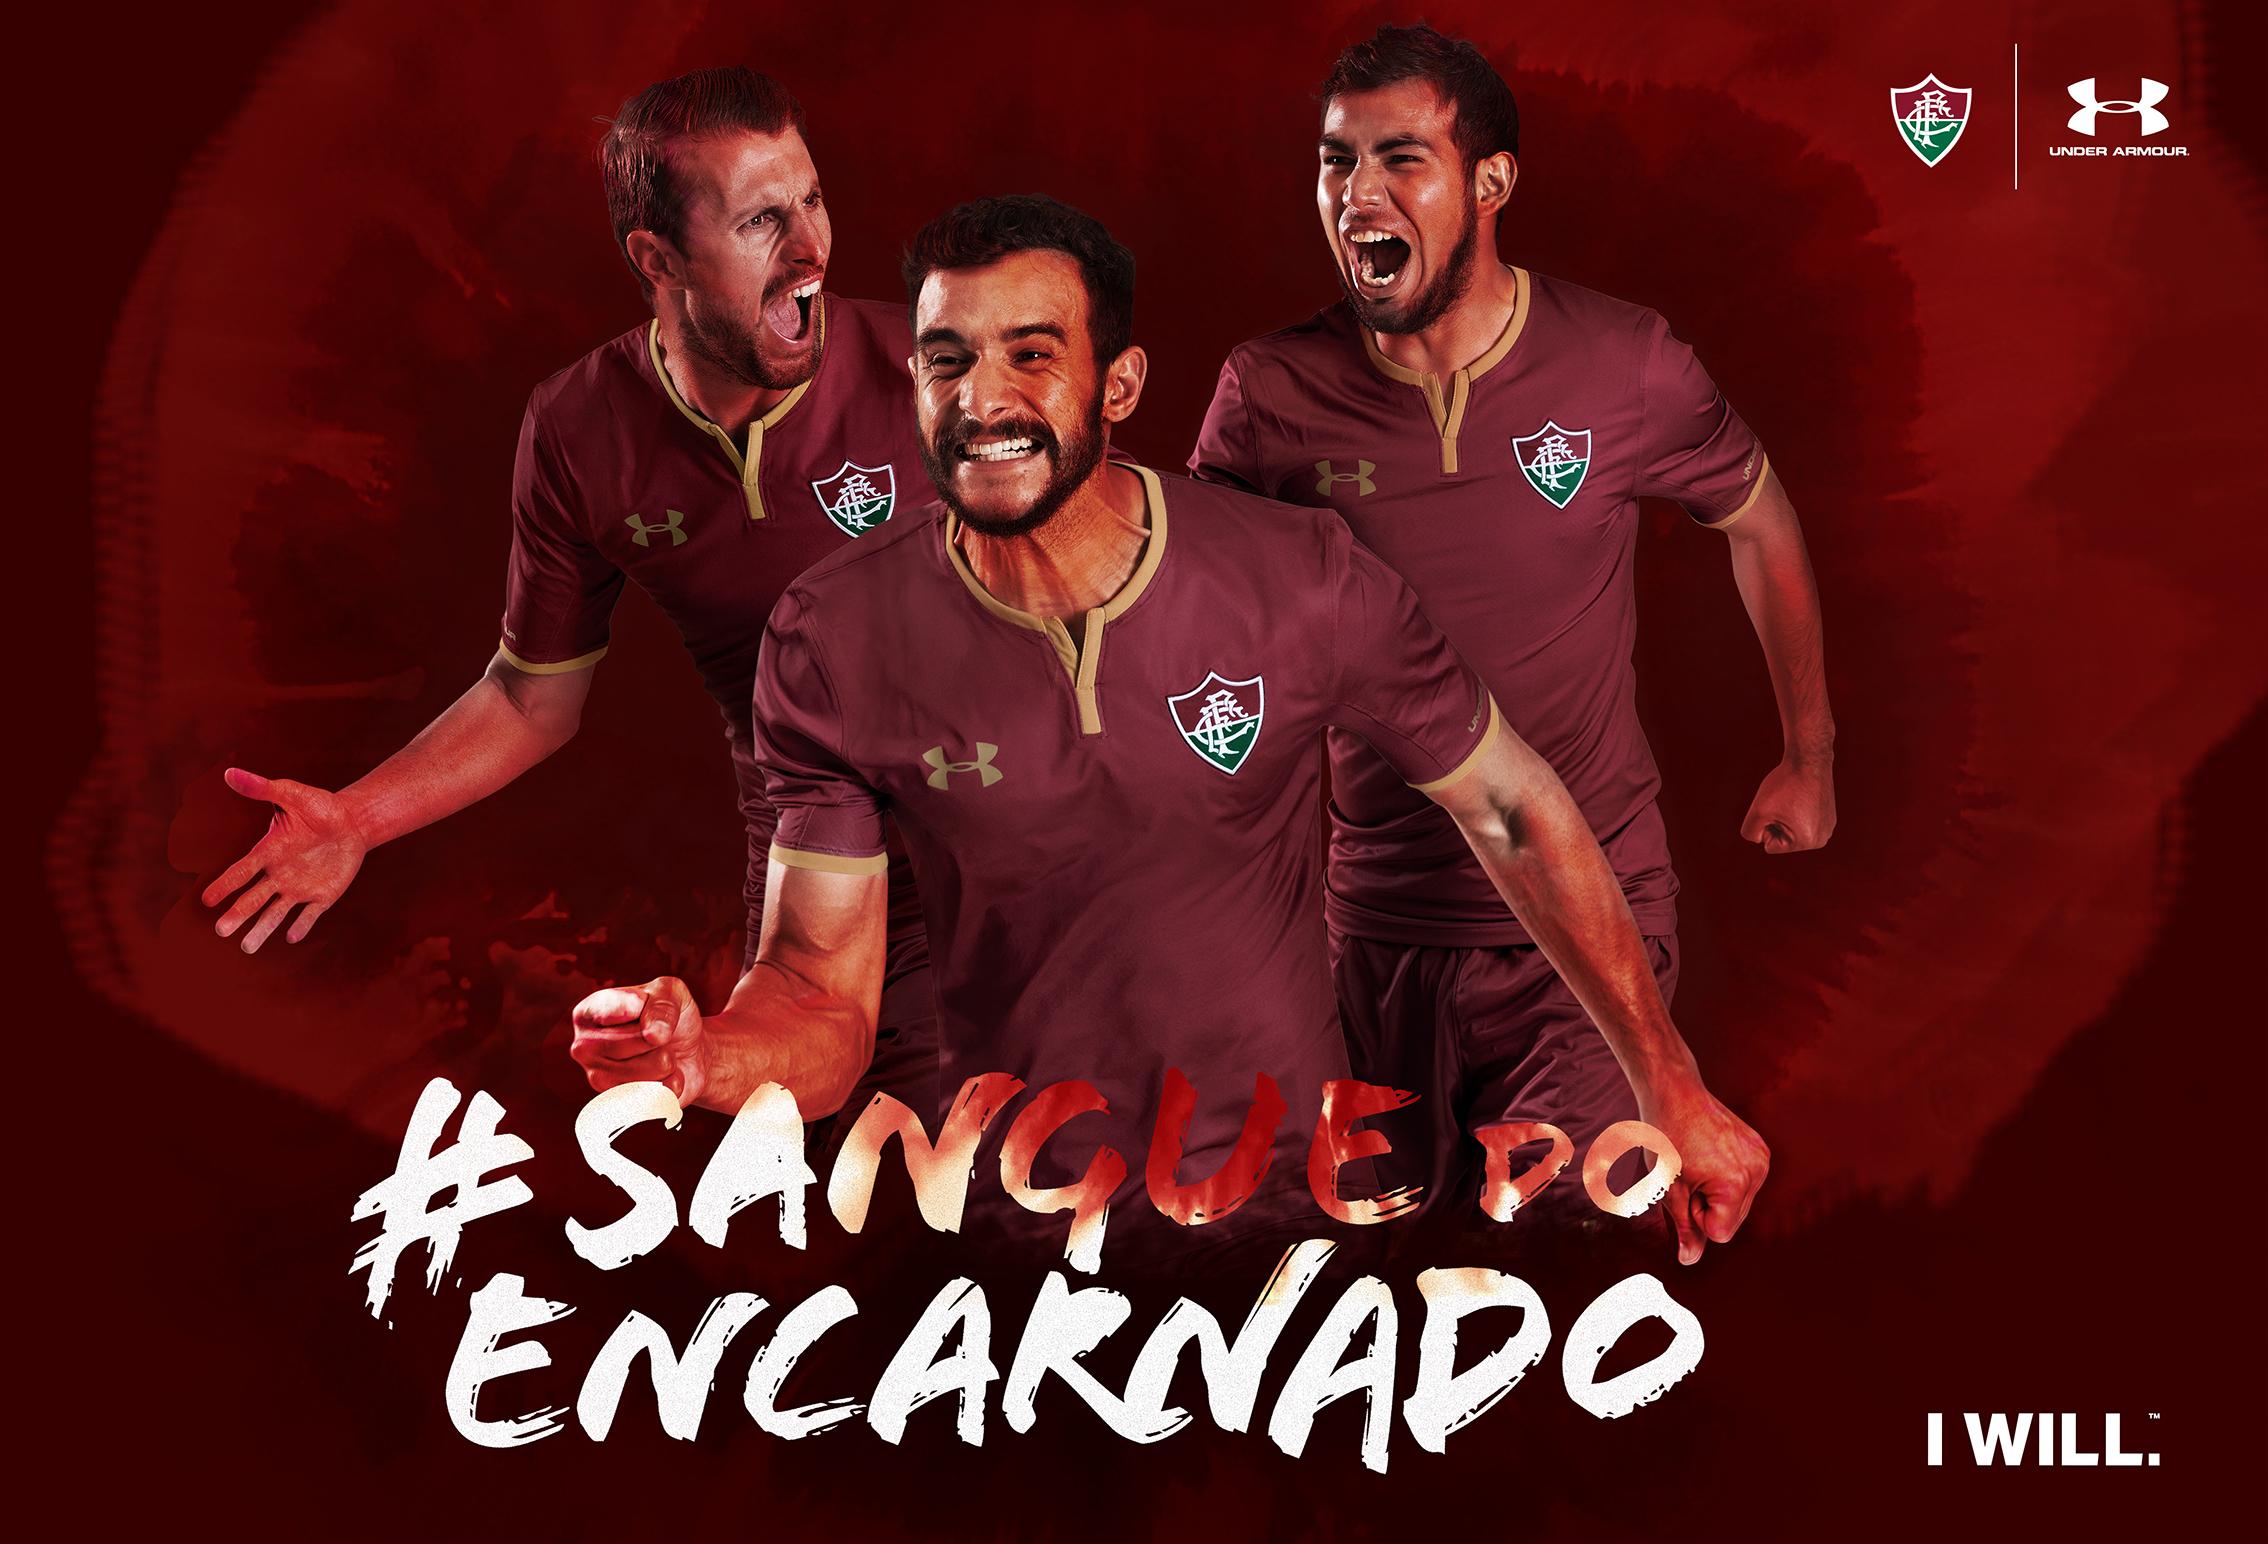 f369c269656d4 Fluminense e Under Armour apresentaram nova camisa 3 nesta terça